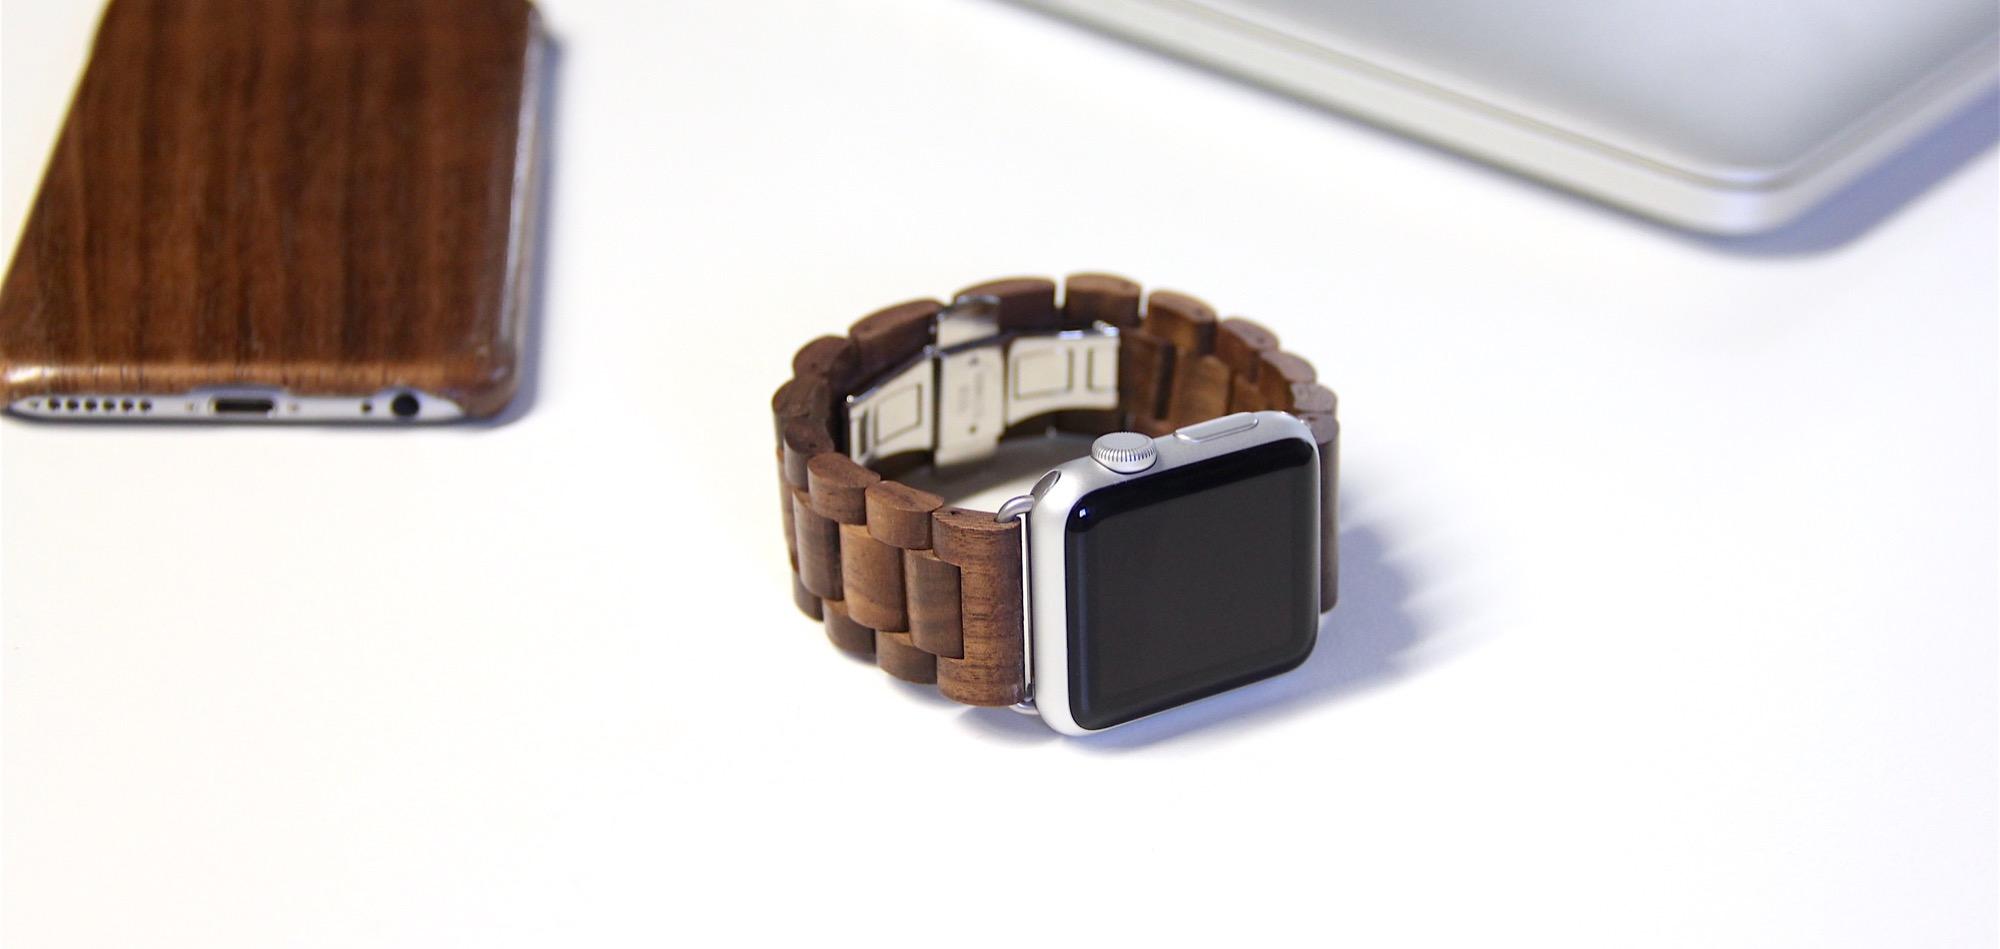 kevlar-holz-iphone-7-case-holzcase-huelle-schlank-wood-duenn-leicht-schutzhuelle-schutz-stabilfolie1